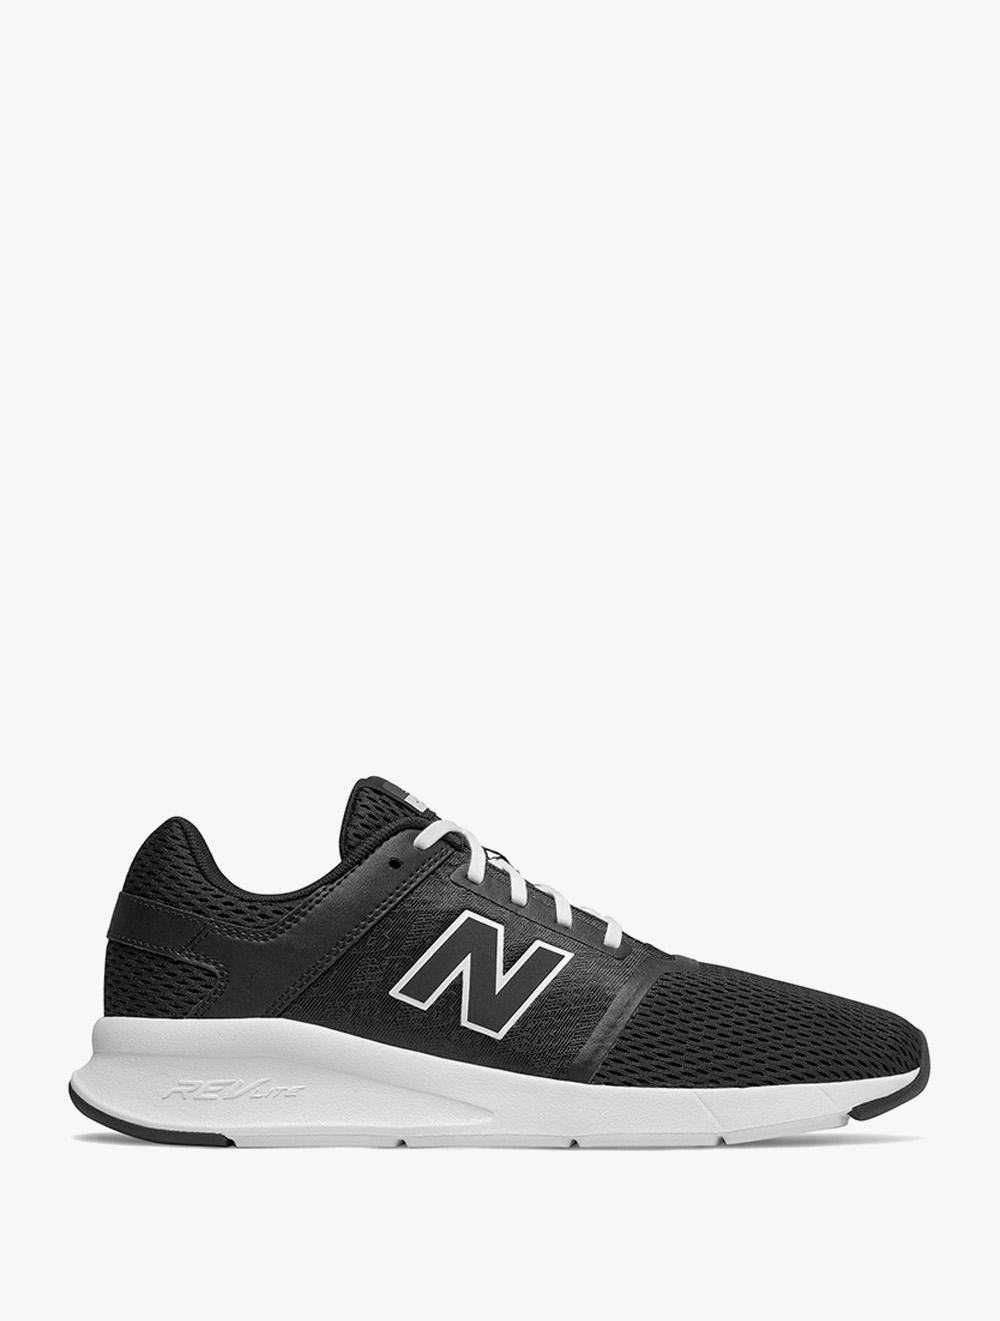 New Balance Indonesia Online Store Harga Sneaker New